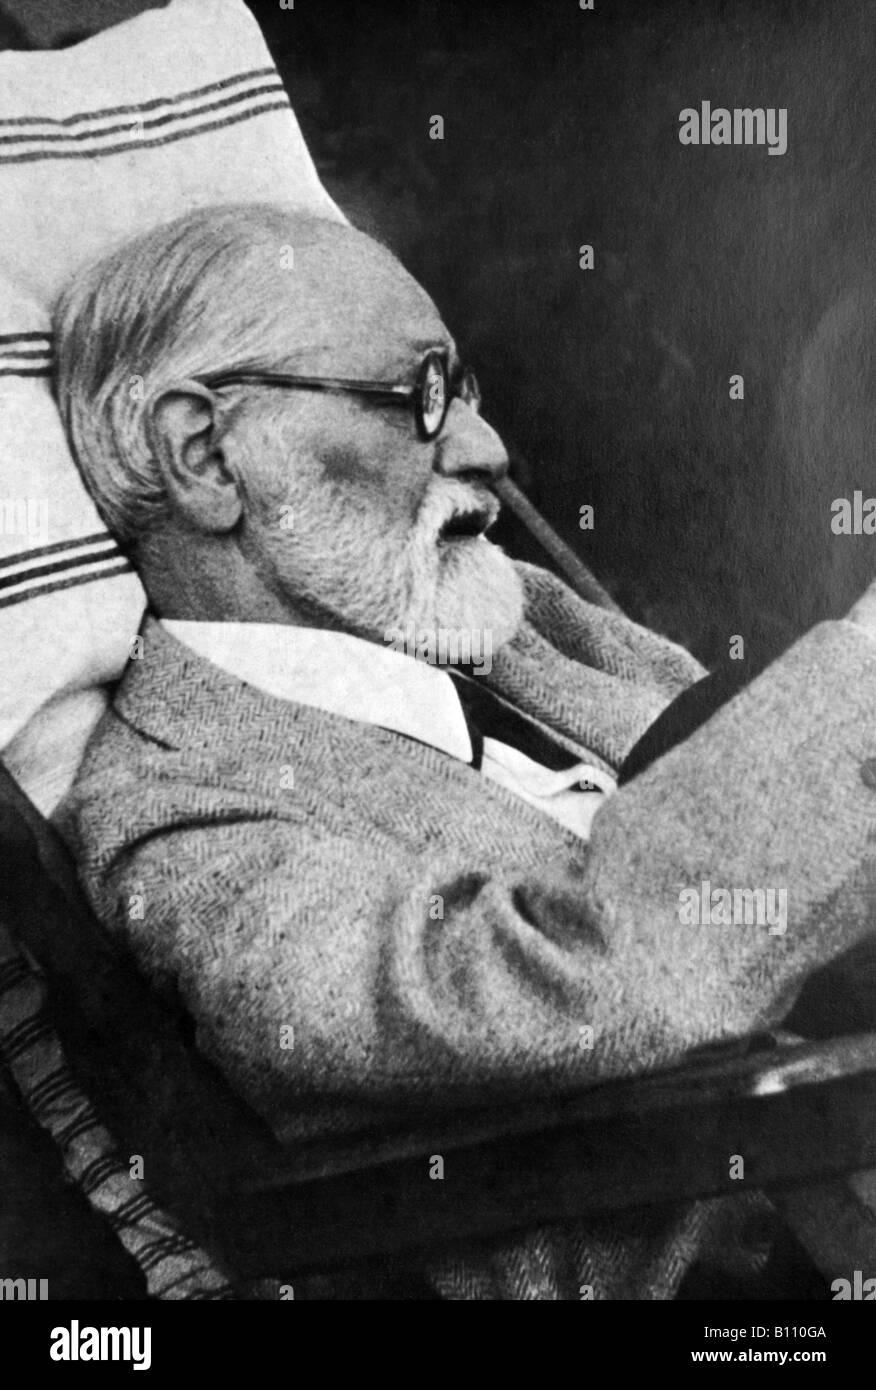 Sigmund Freud, 1856 - 1939, Austrian psychologist. - Stock Image